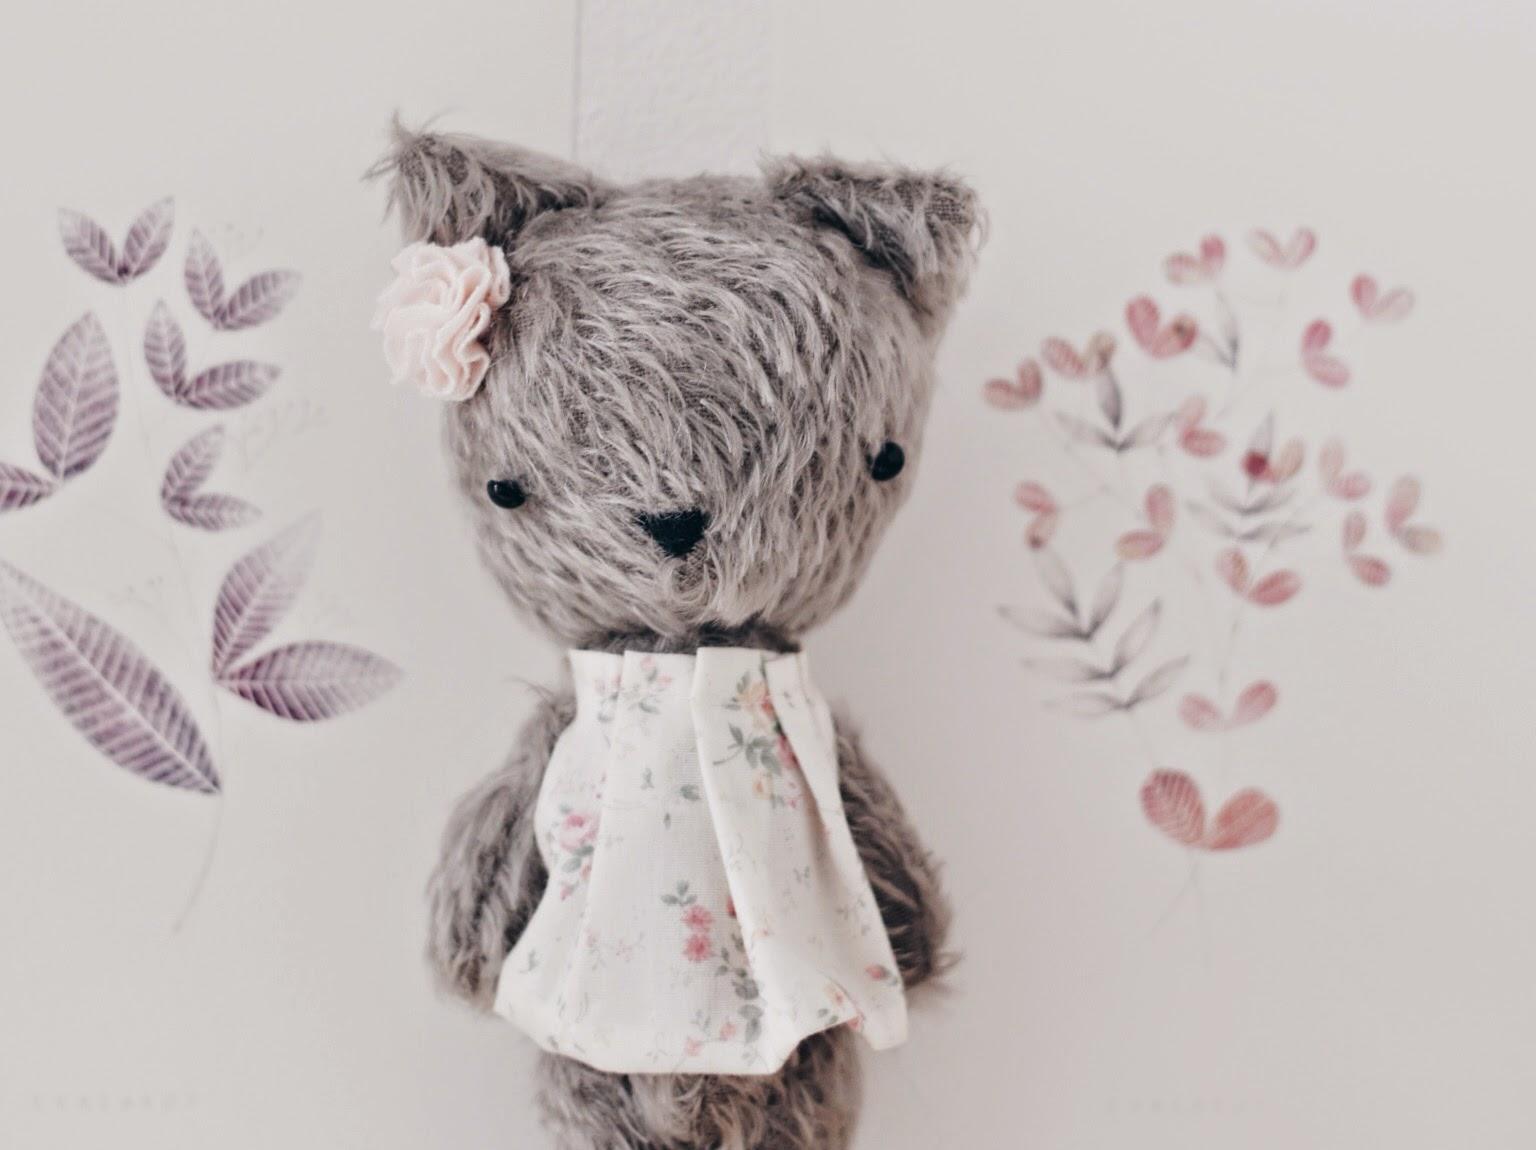 único, ooak, handmade, cute, softie, cat, kitty